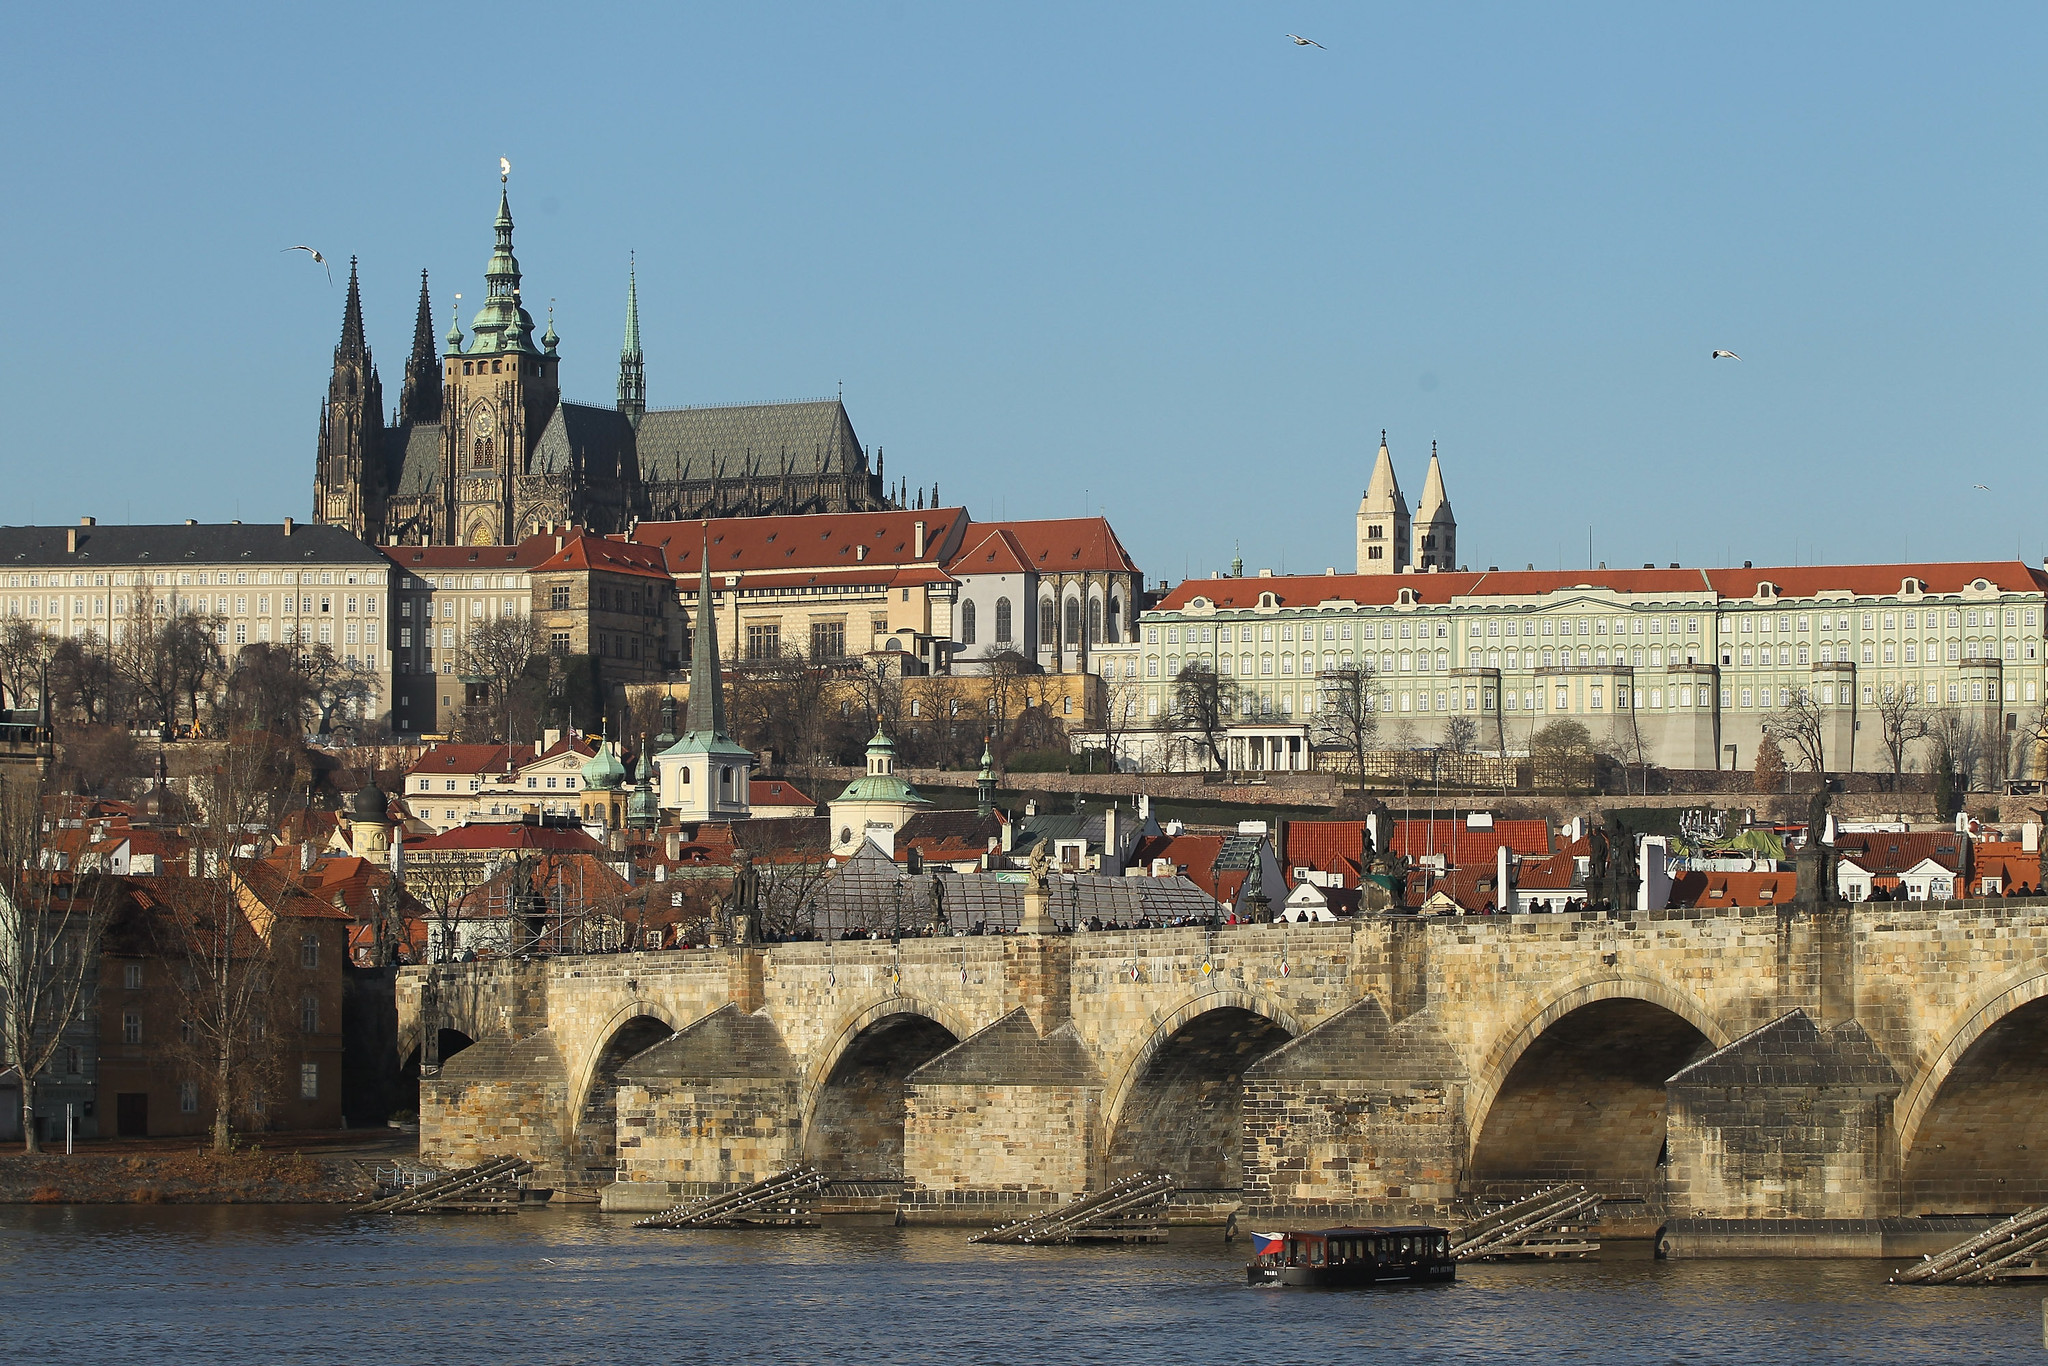 Czech Republic: Tour Prague with expert private guide